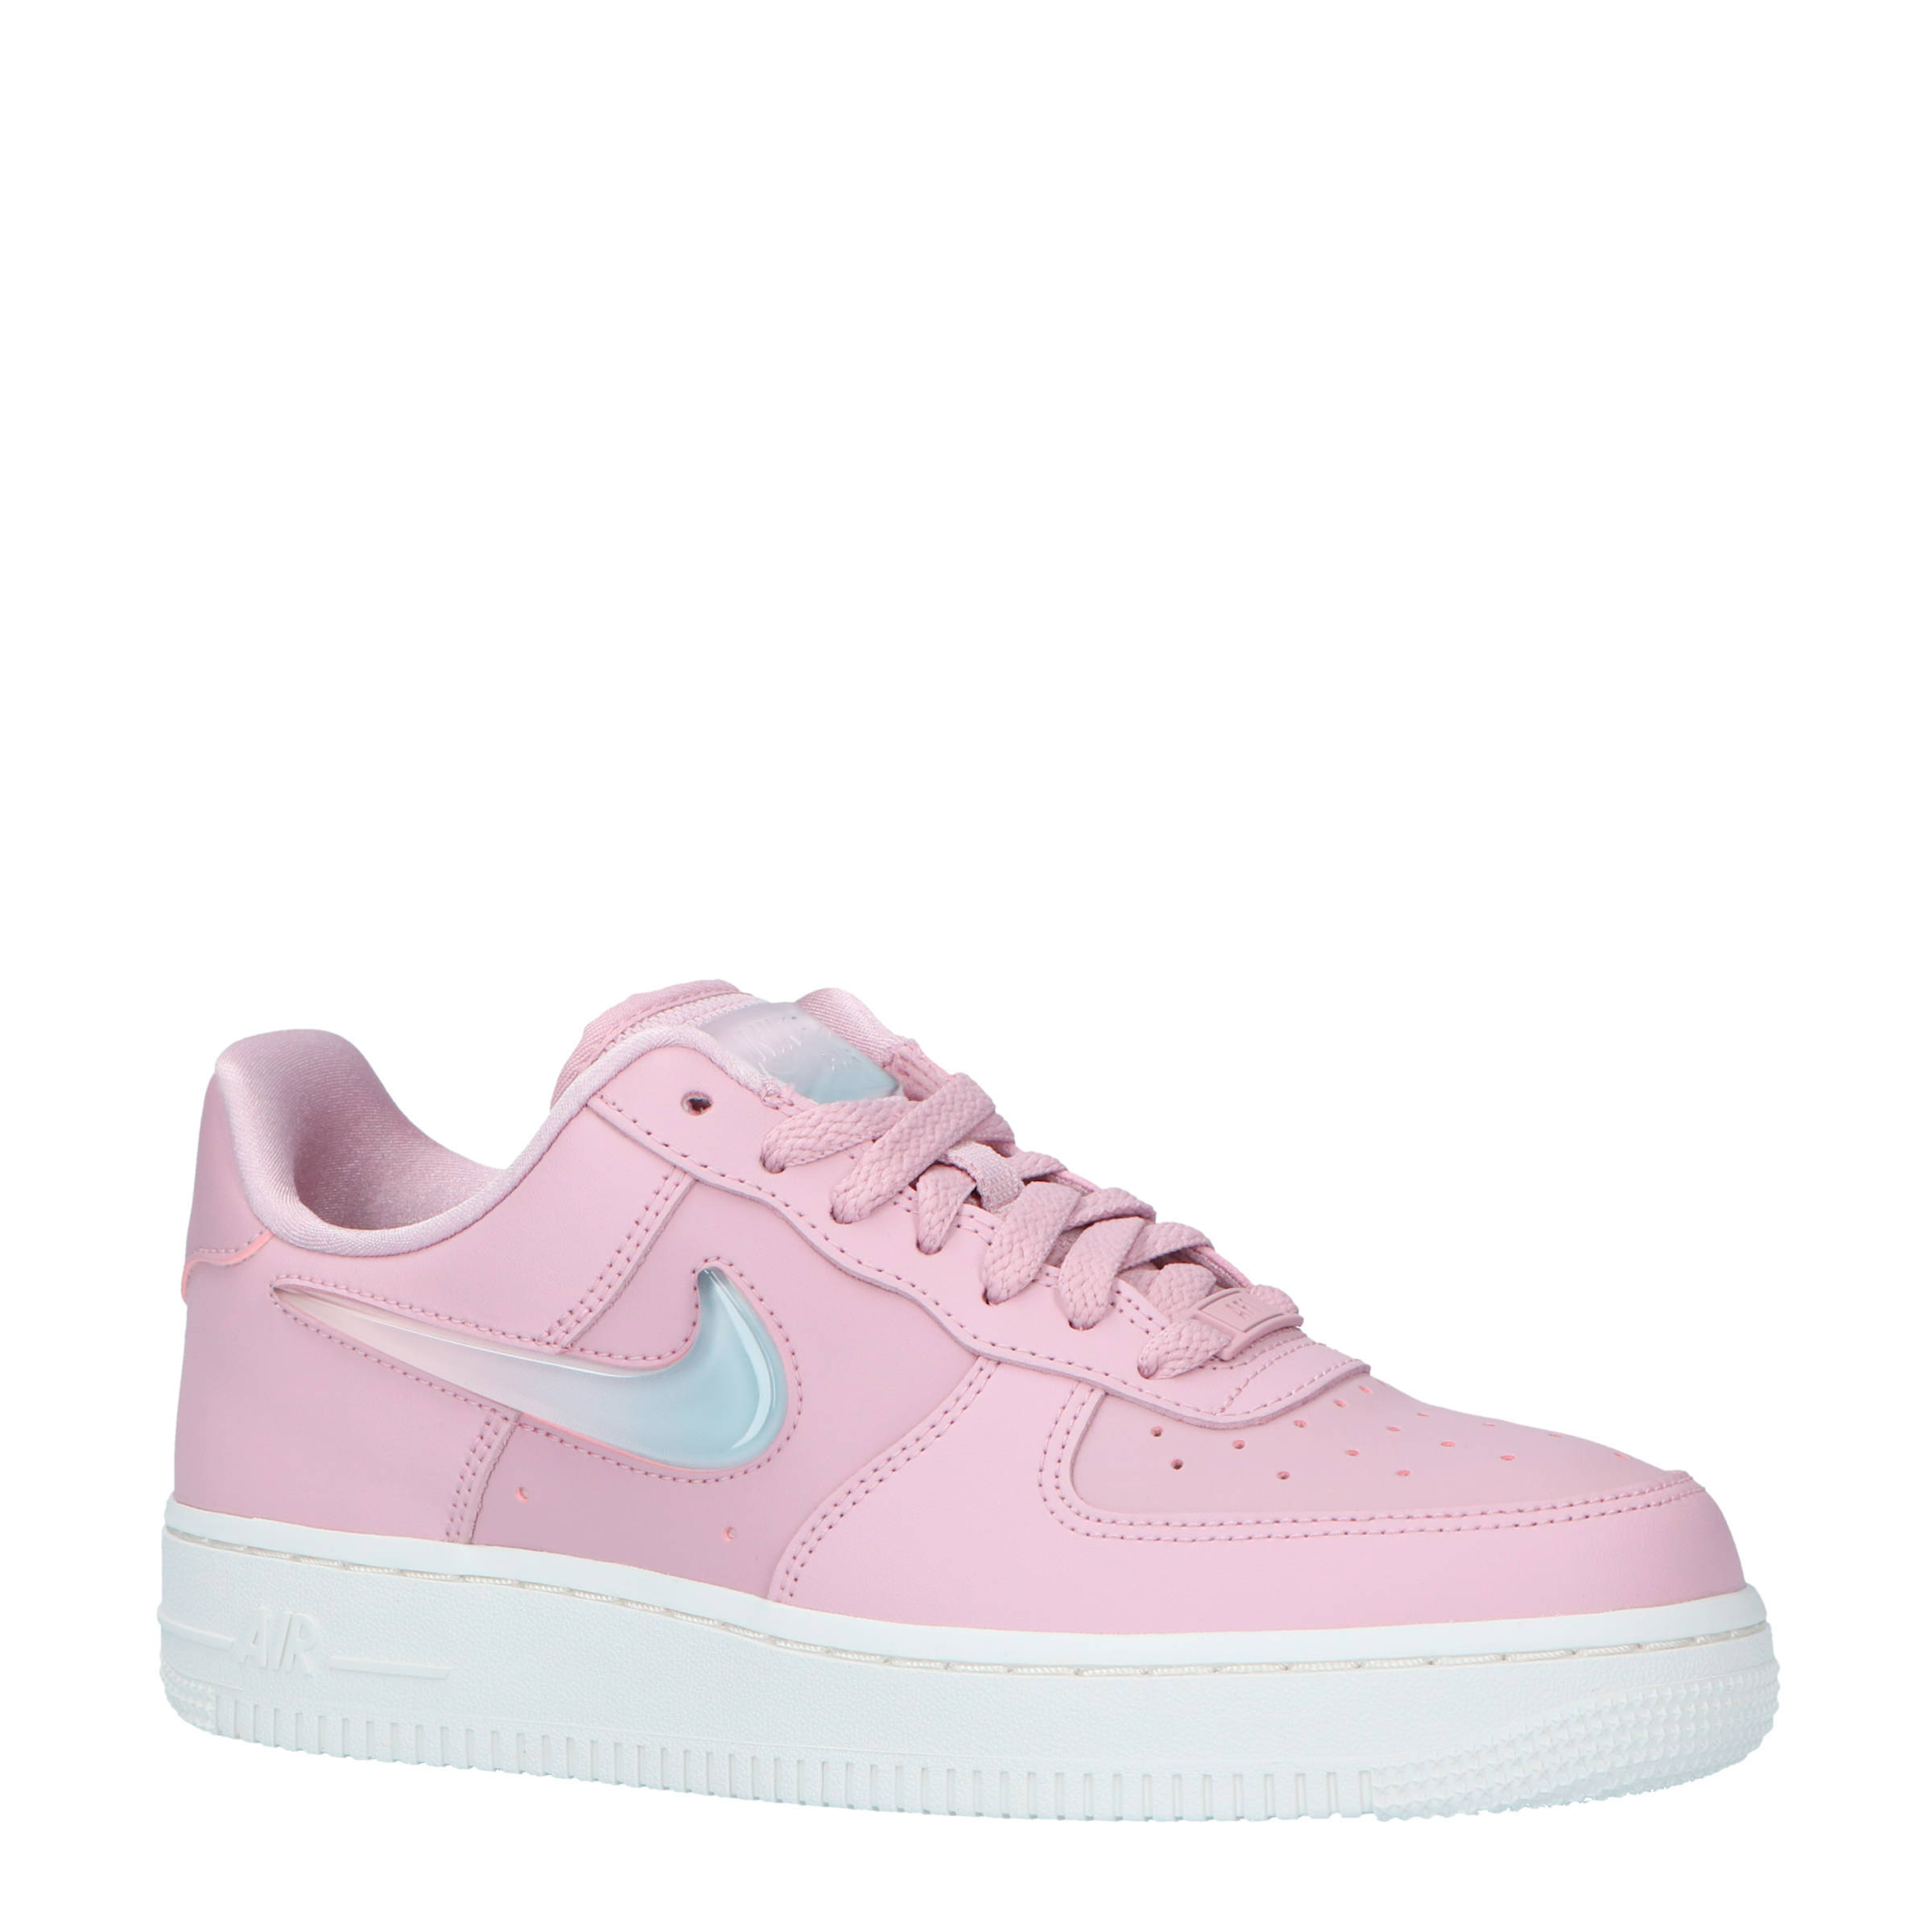 nike air force 1 07 se roze